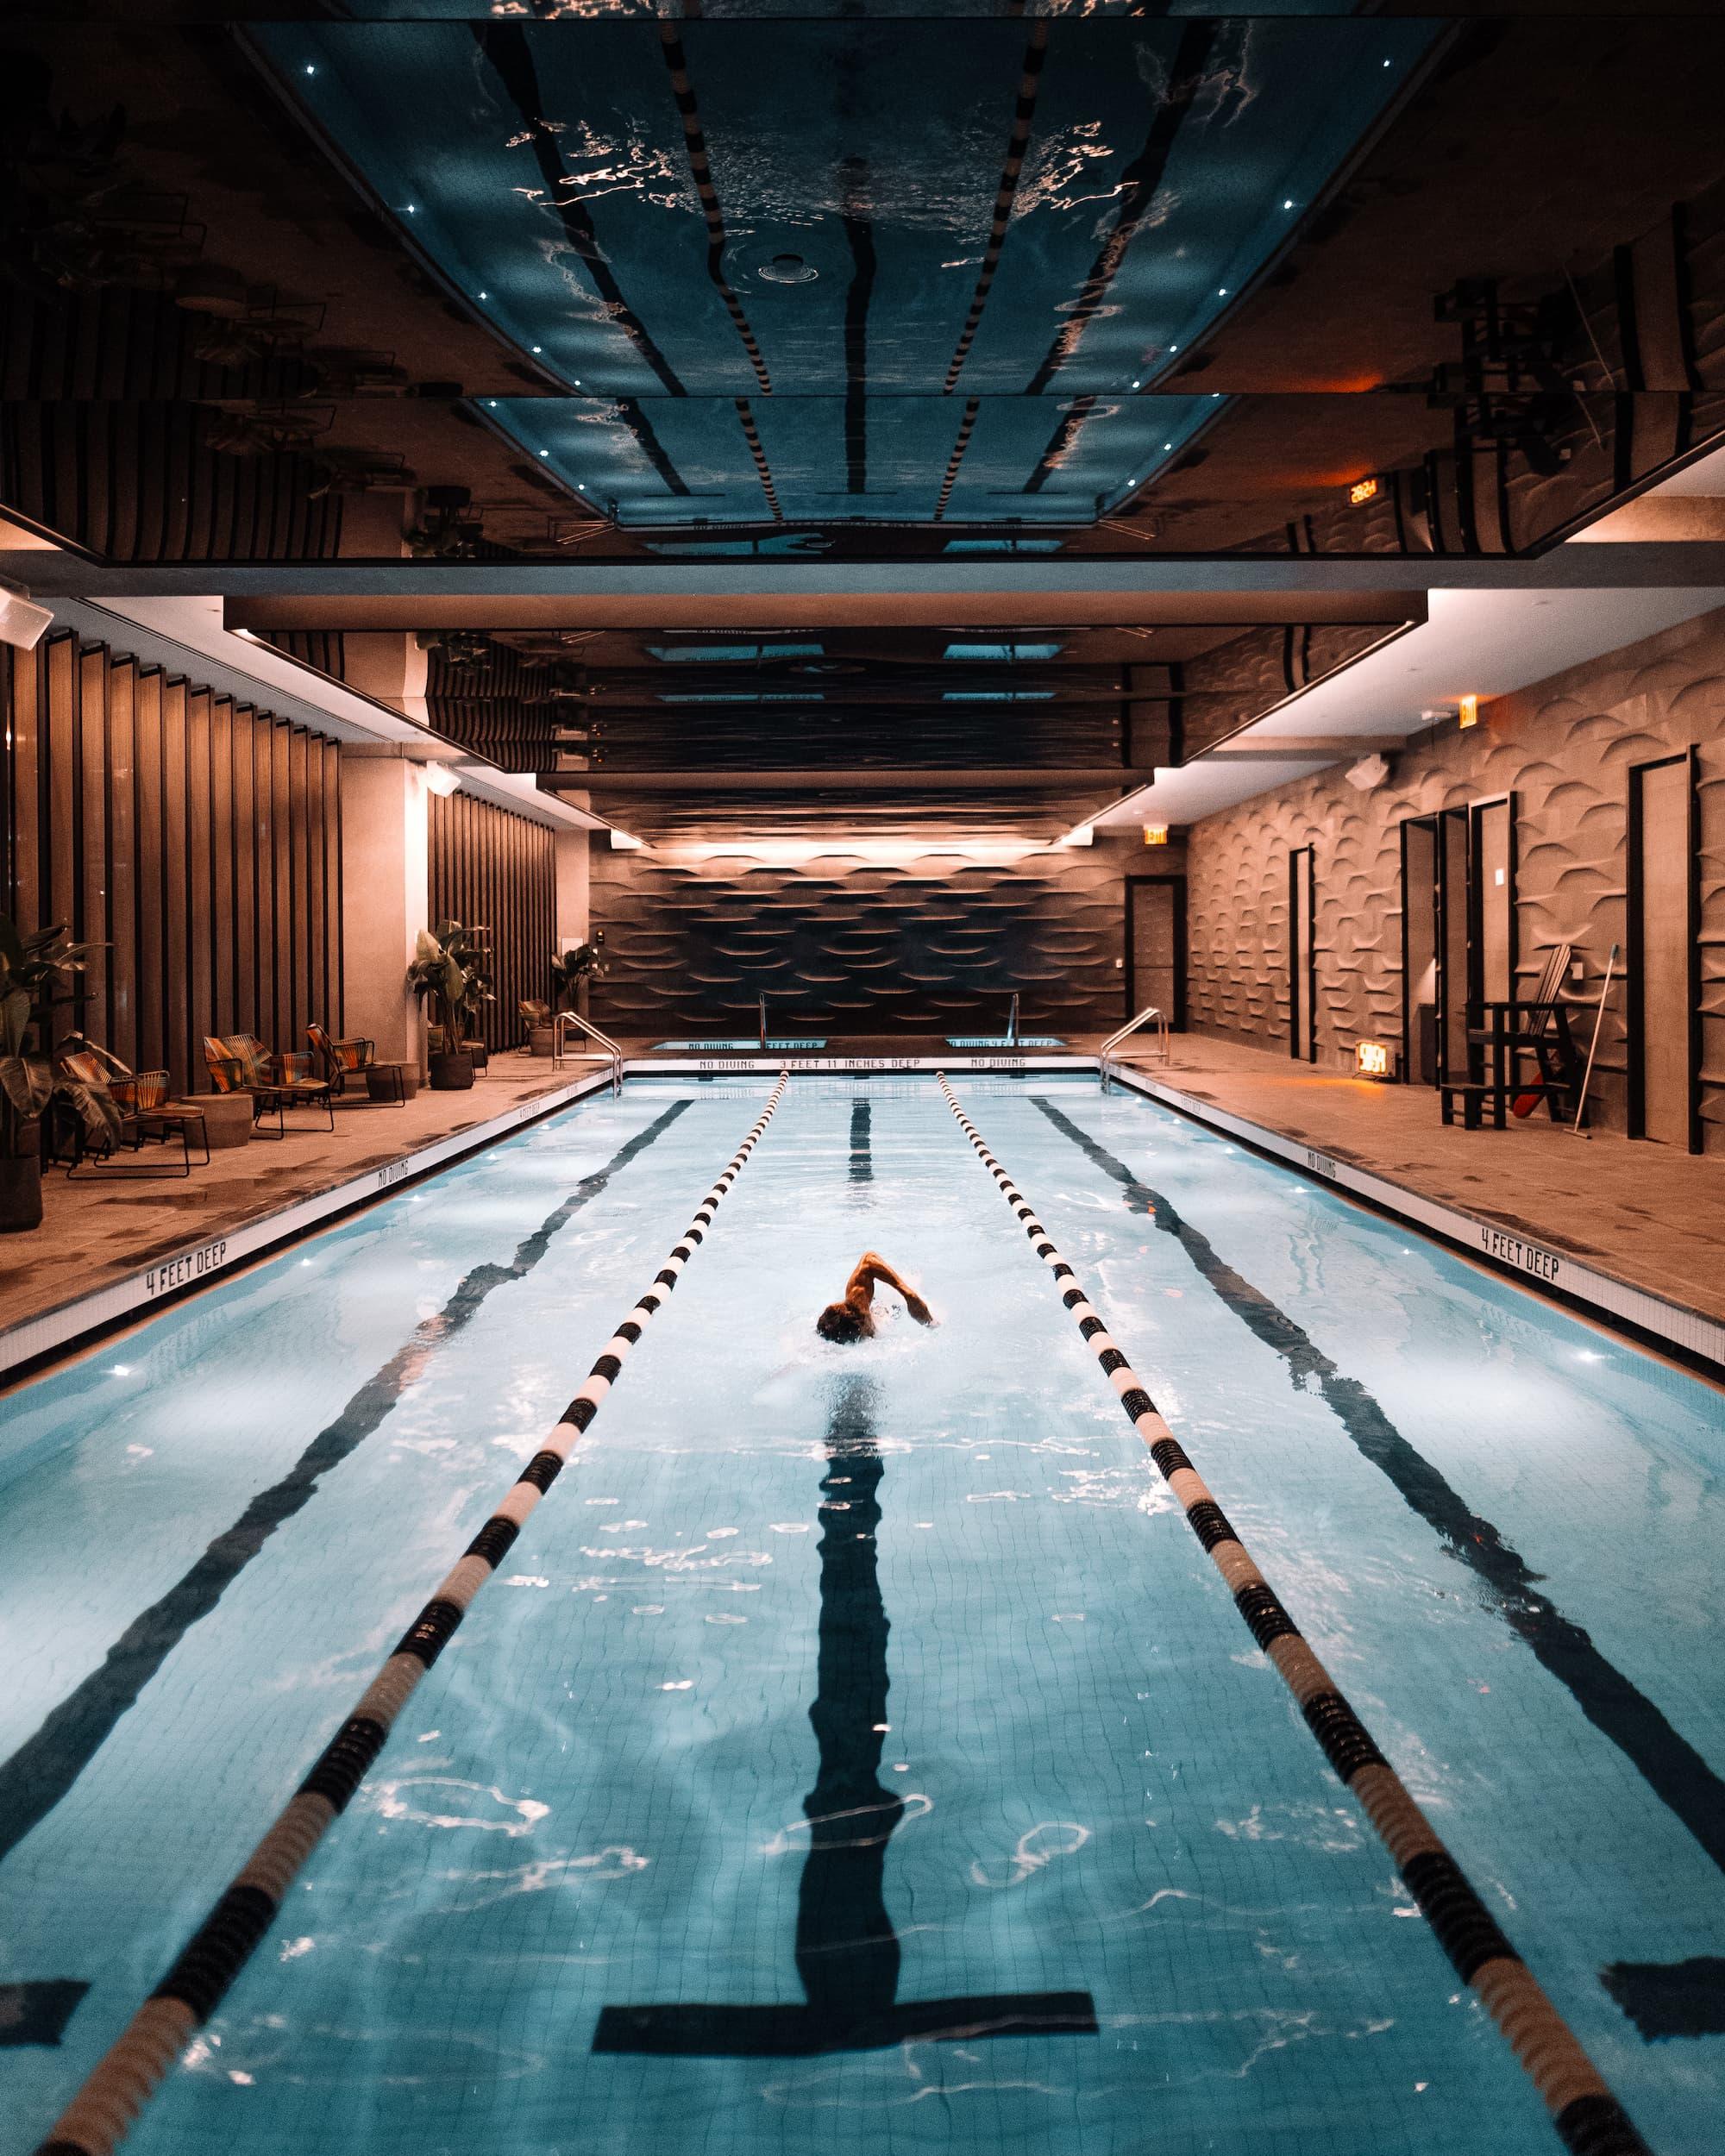 man swimming laps in indoor pool